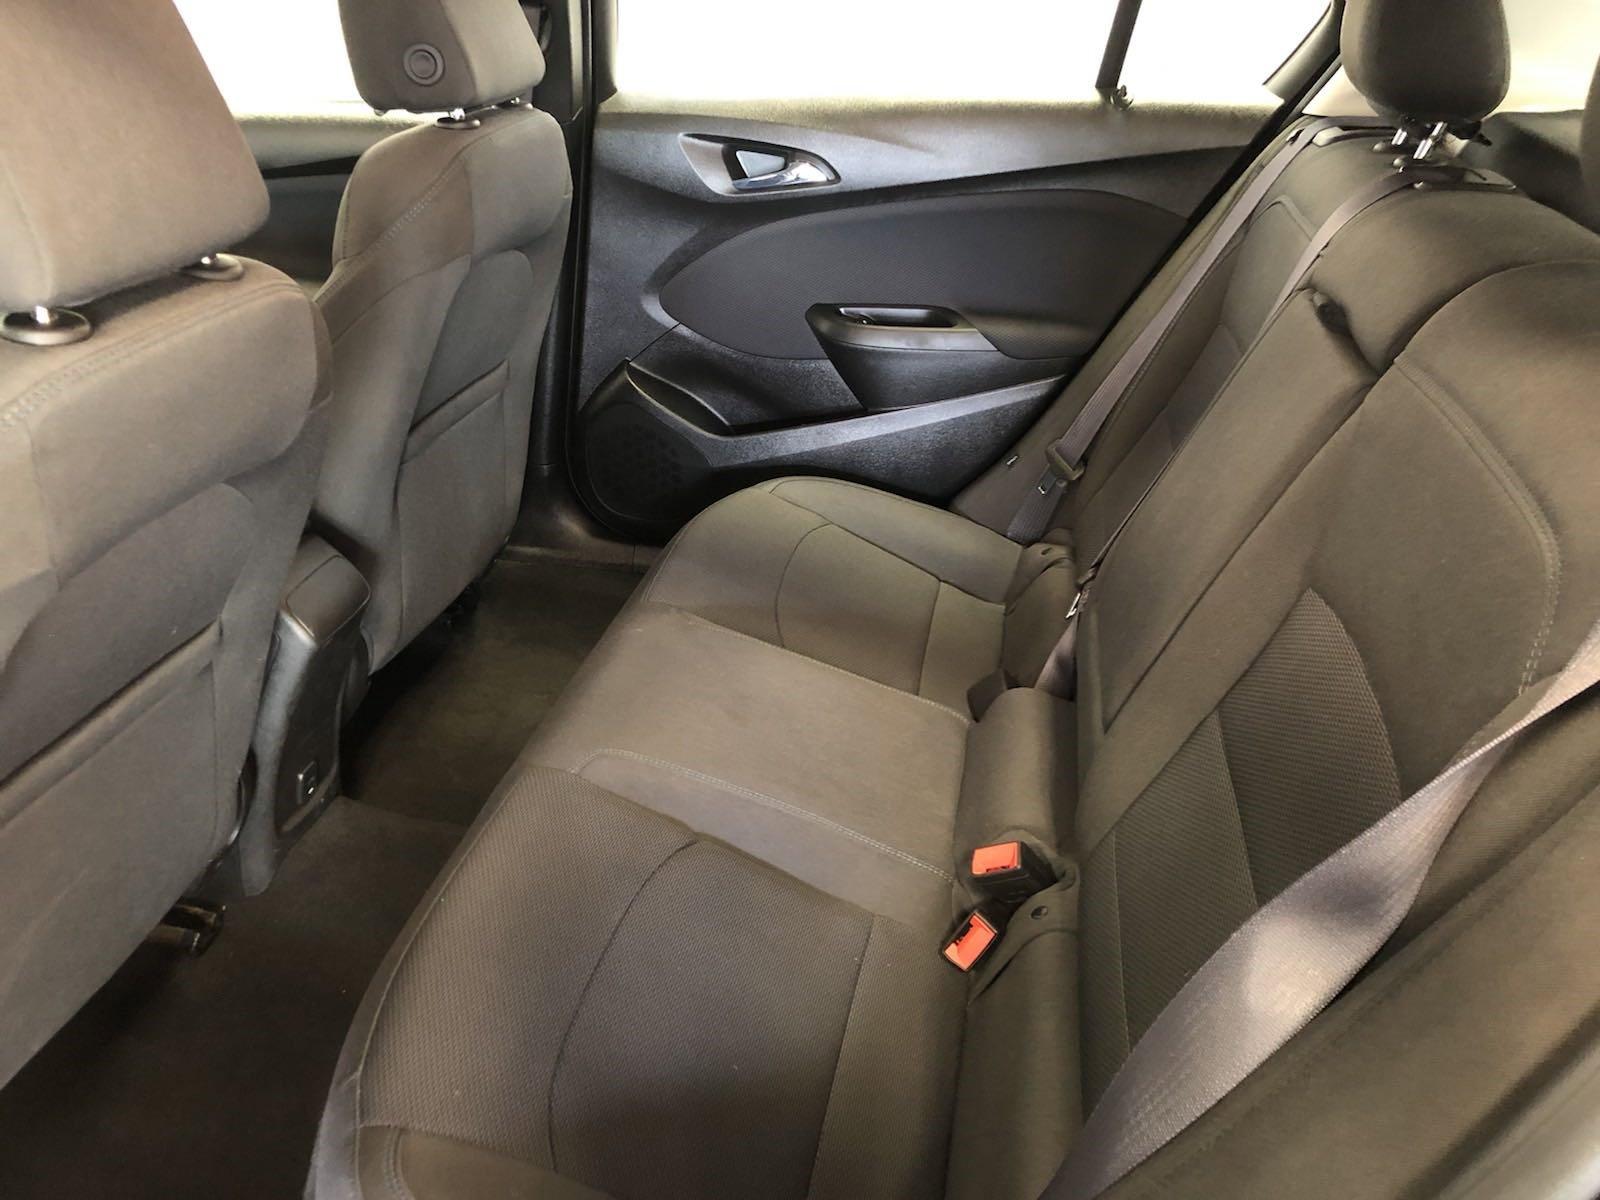 Used 2017 Chevrolet Cruze LT Hatchback for sale in St Joseph MO